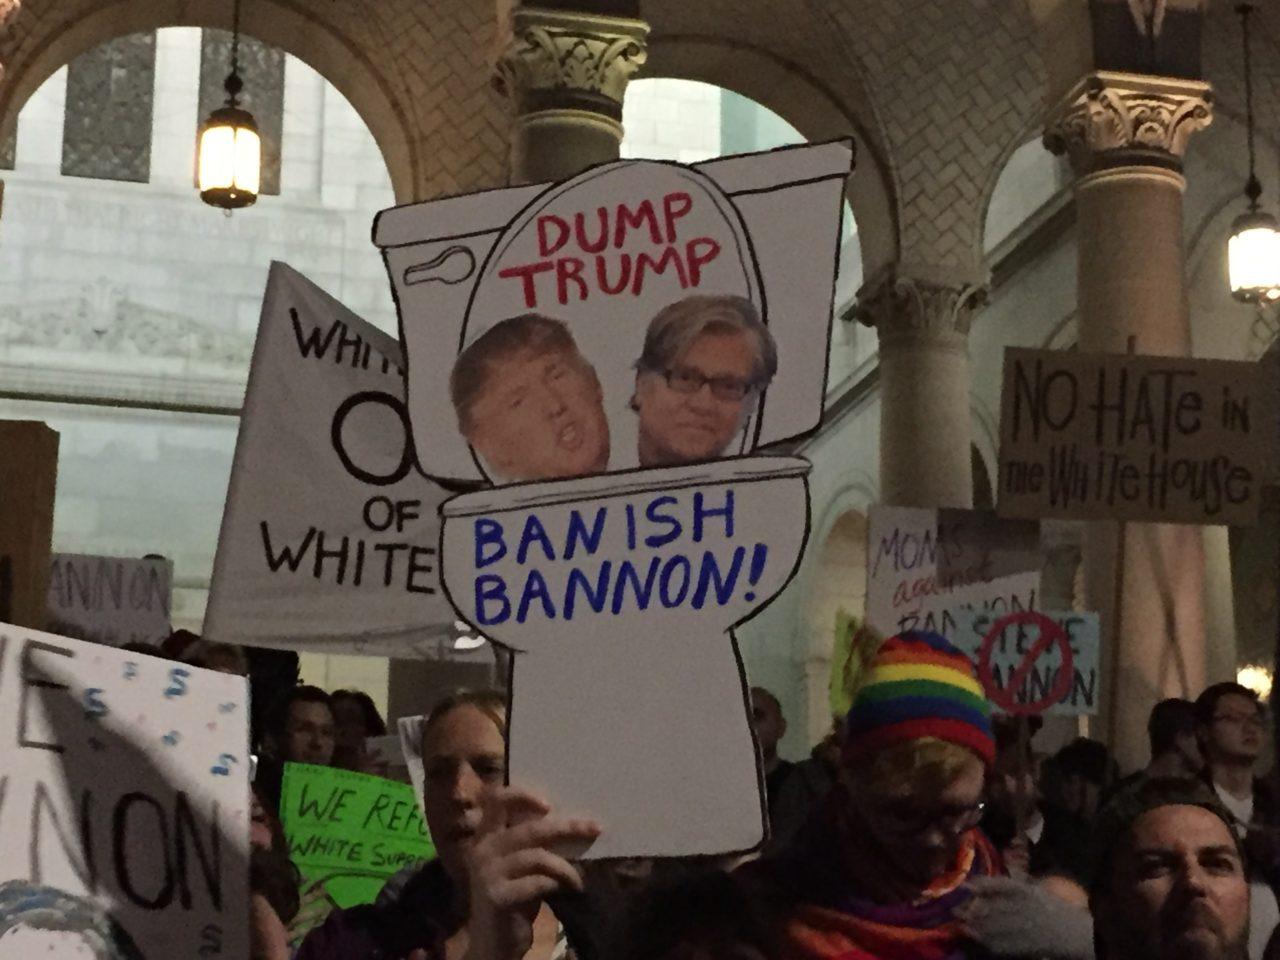 Stop Bannon Protest Los Angeles (Joel Pollak / Breitbart News)